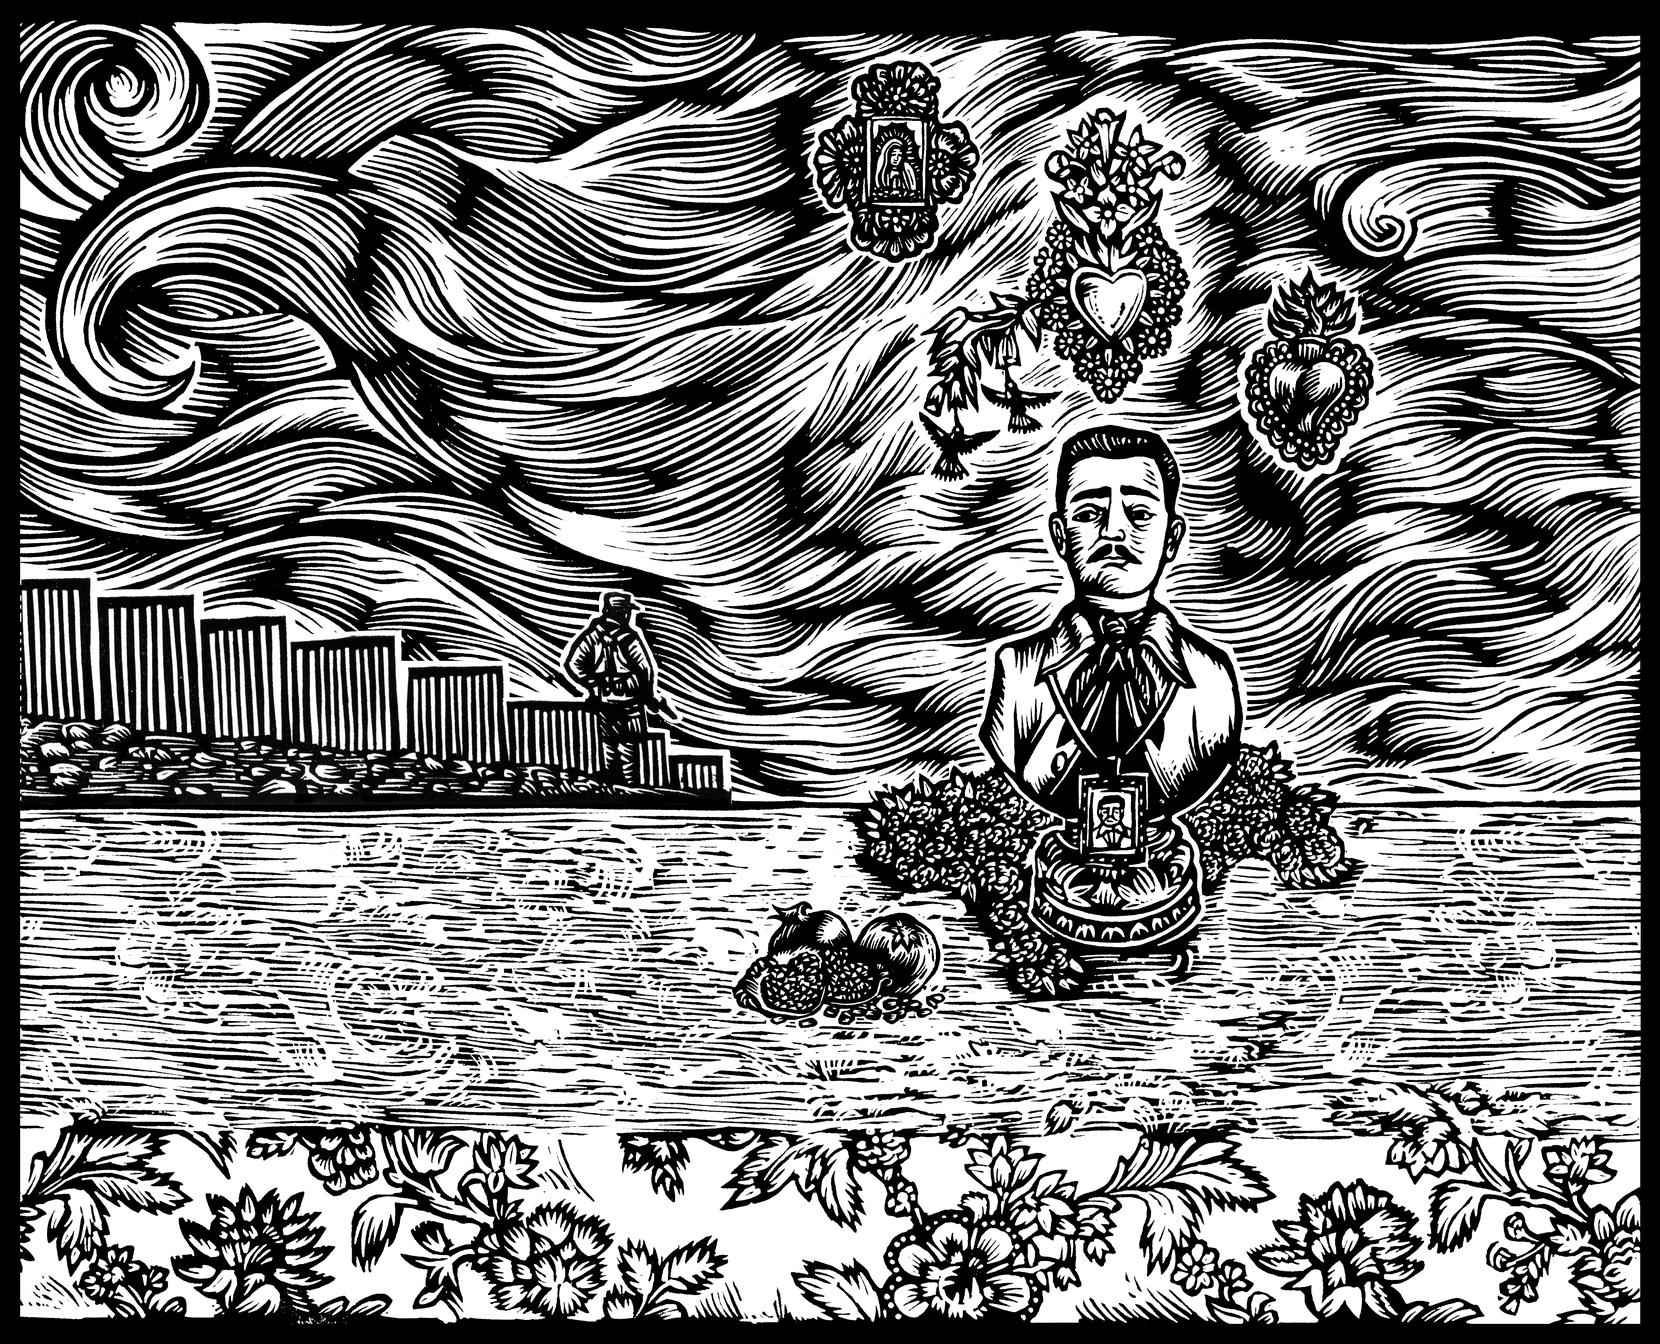 Illustration by Daniel Gonzalez.